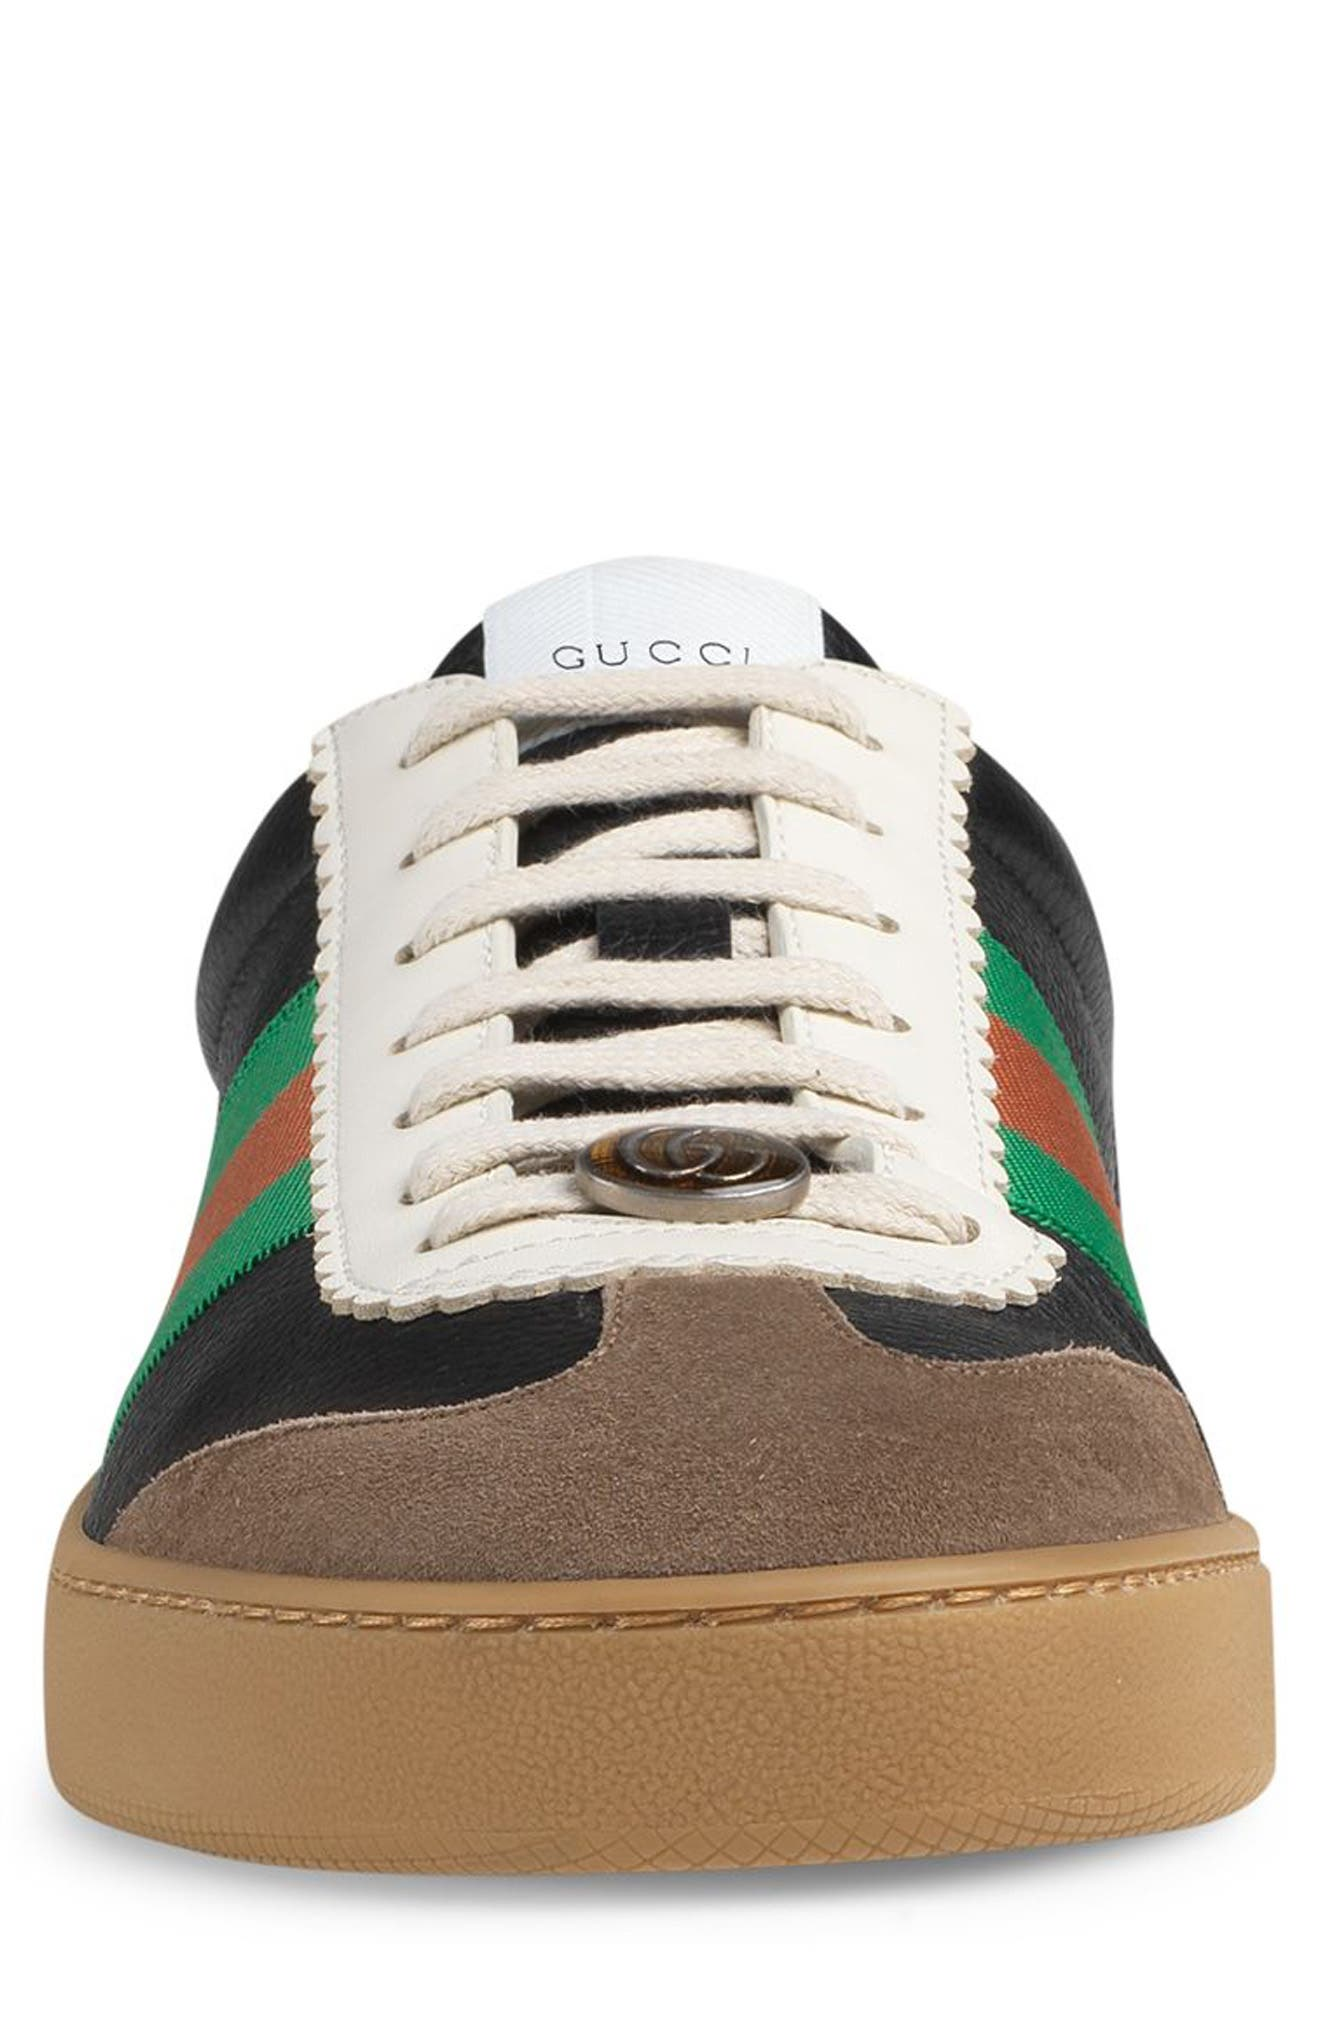 Web Sneaker,                             Alternate thumbnail 4, color,                             ARDESIA/ BLACK